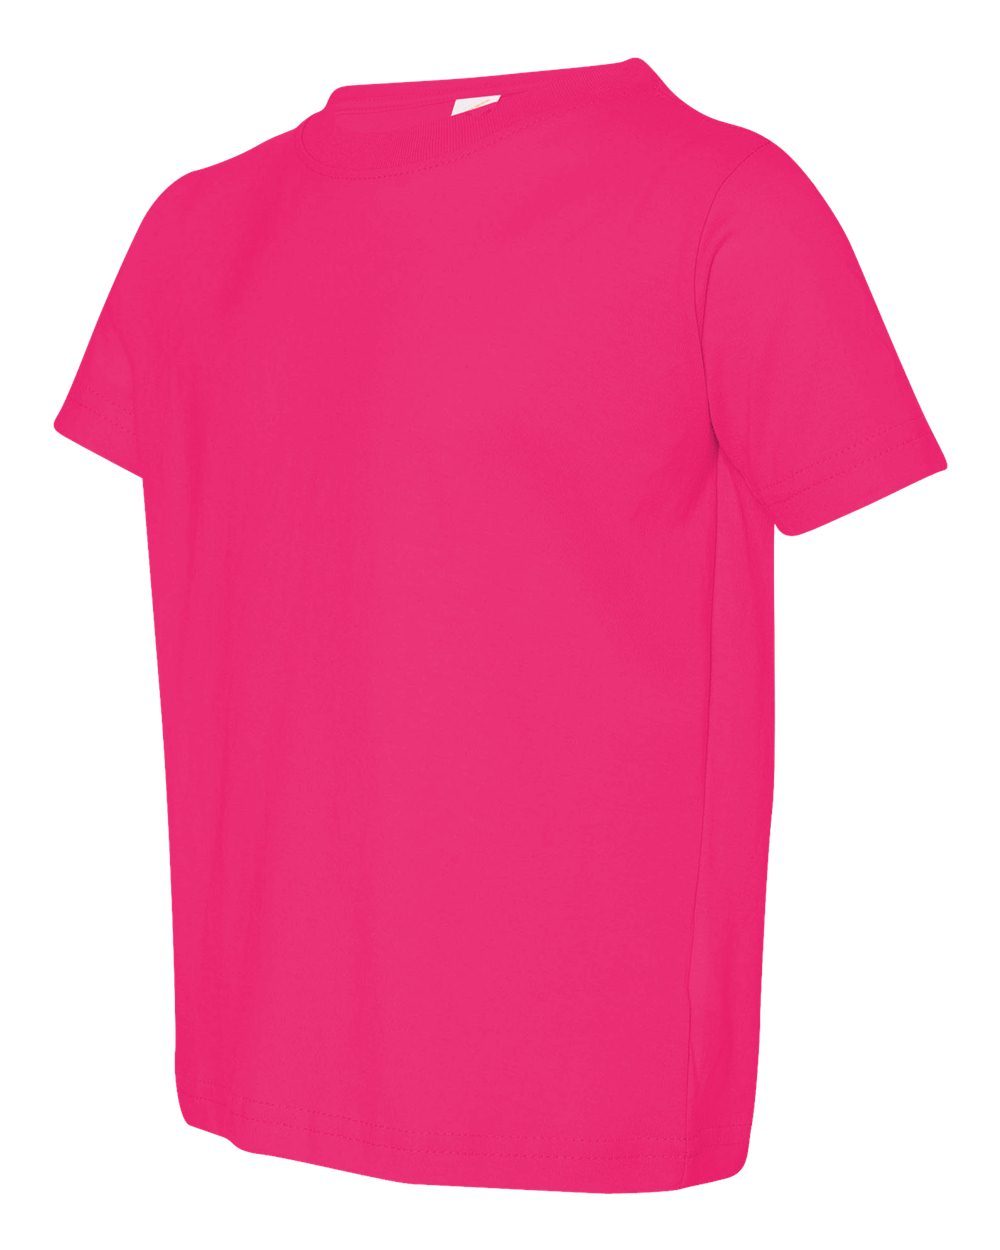 Rabbit Skins 3321 - Fine Jersey Toddler T-Shirt